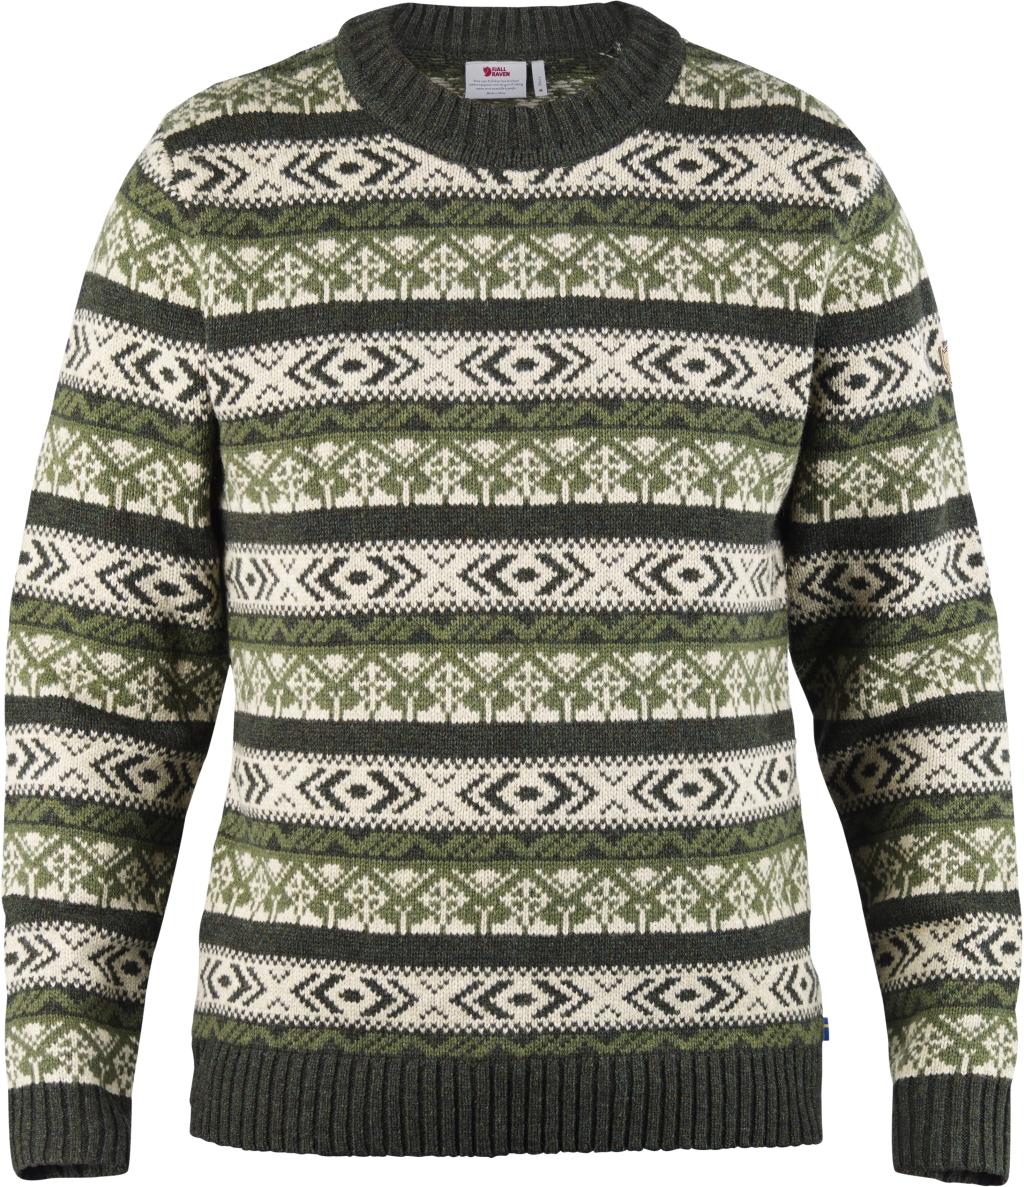 FjallRaven Ovik Folk Knit Sweater Dark Olive-30